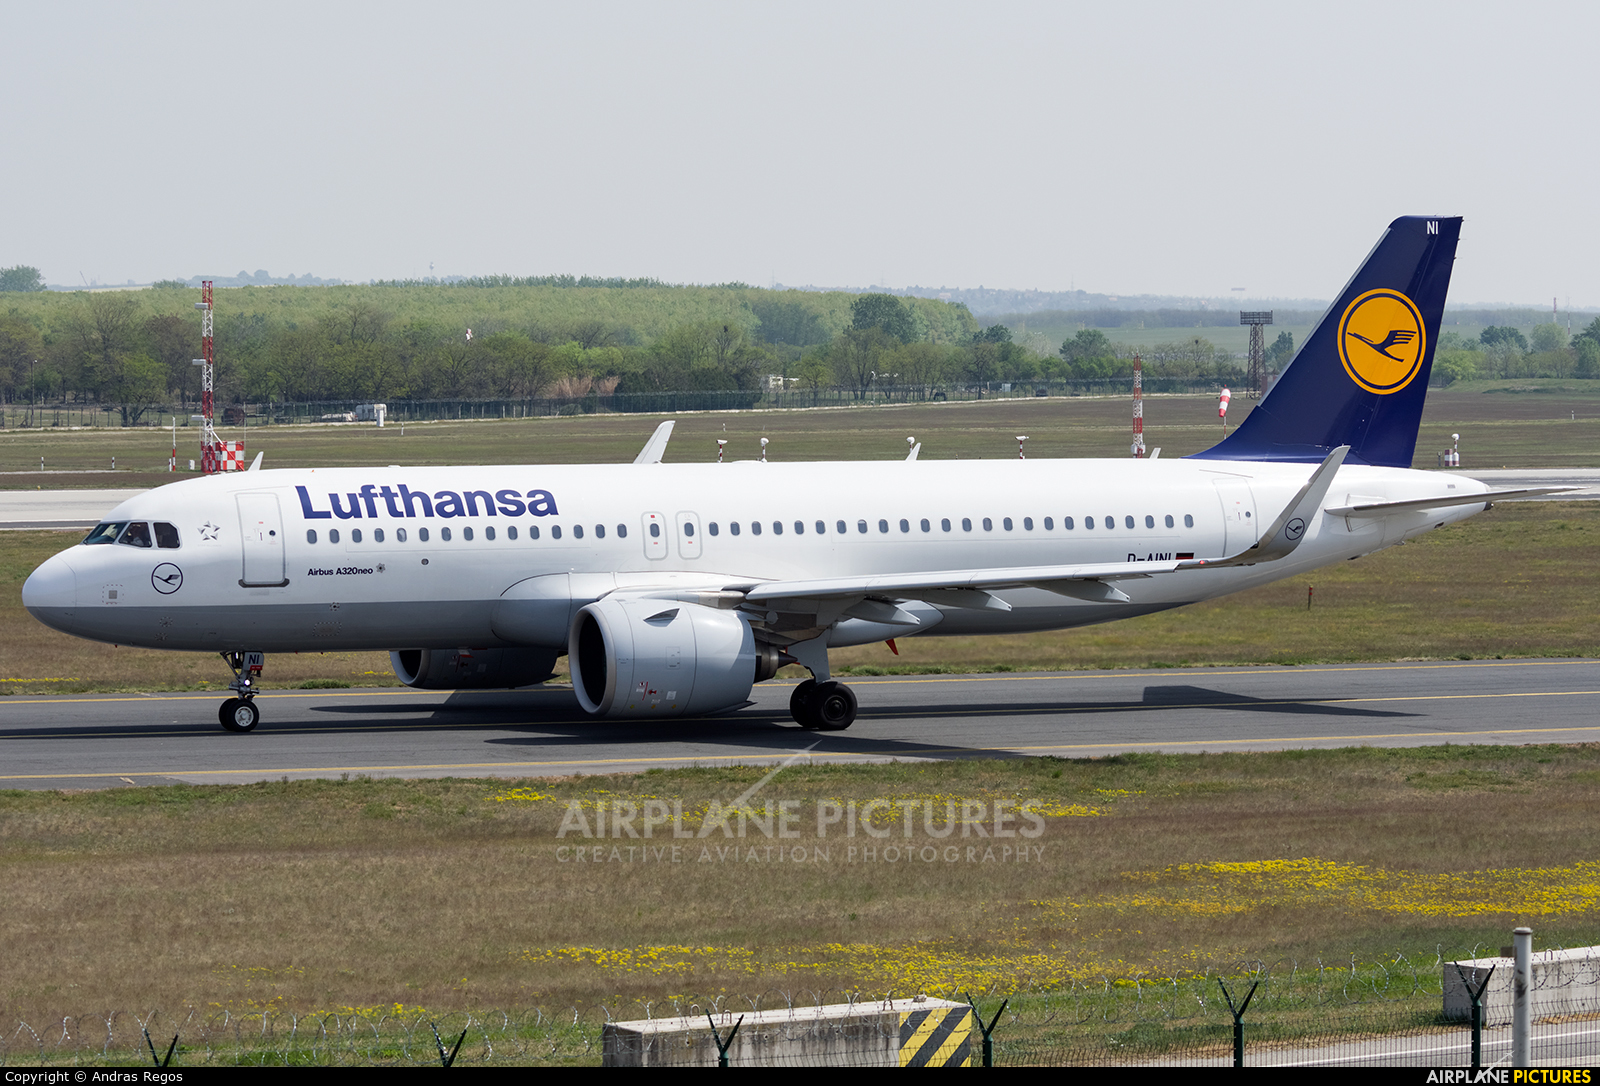 Lufthansa D-AINI aircraft at Budapest Ferenc Liszt International Airport